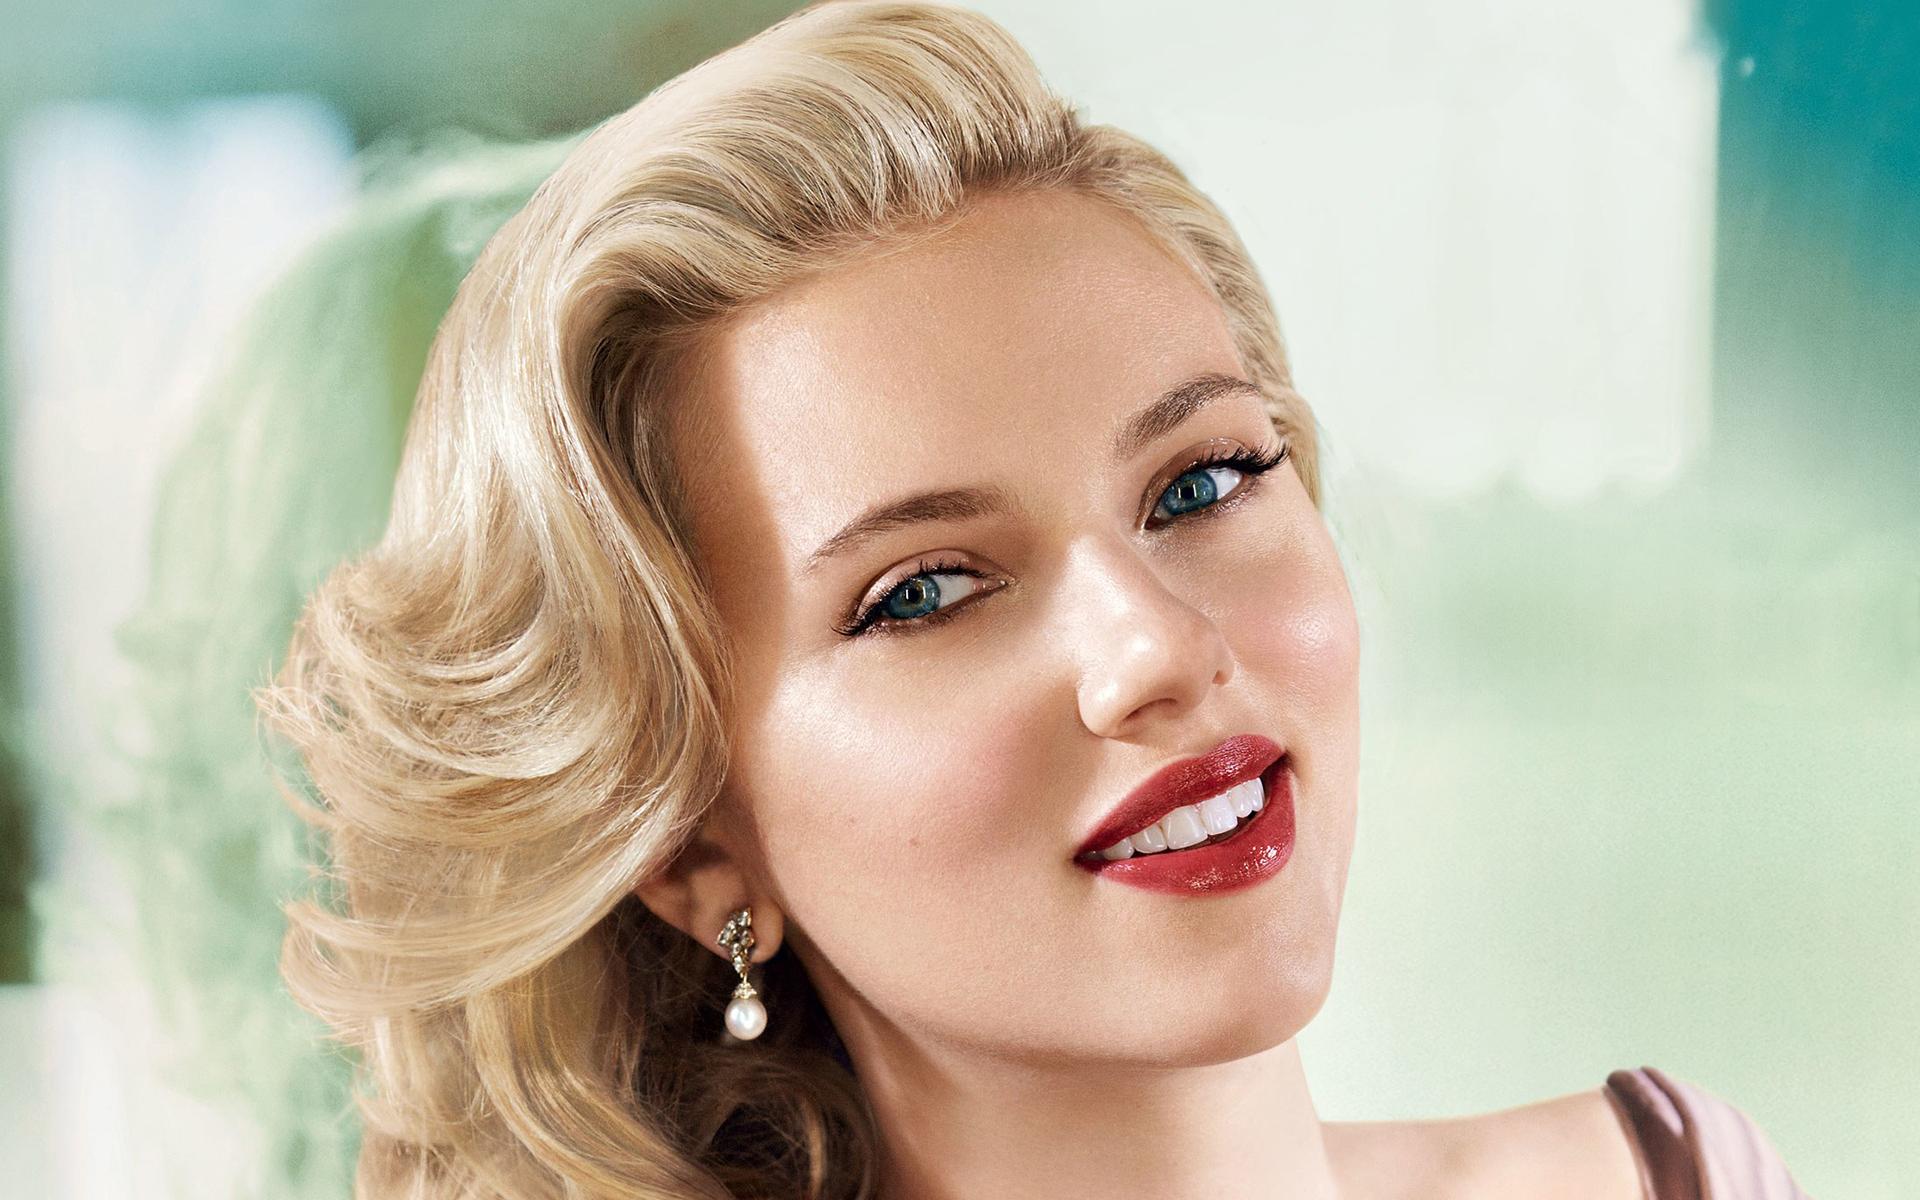 1920x1200 Scarlett Johansson 2018 1080P Resolution HD 4k ...